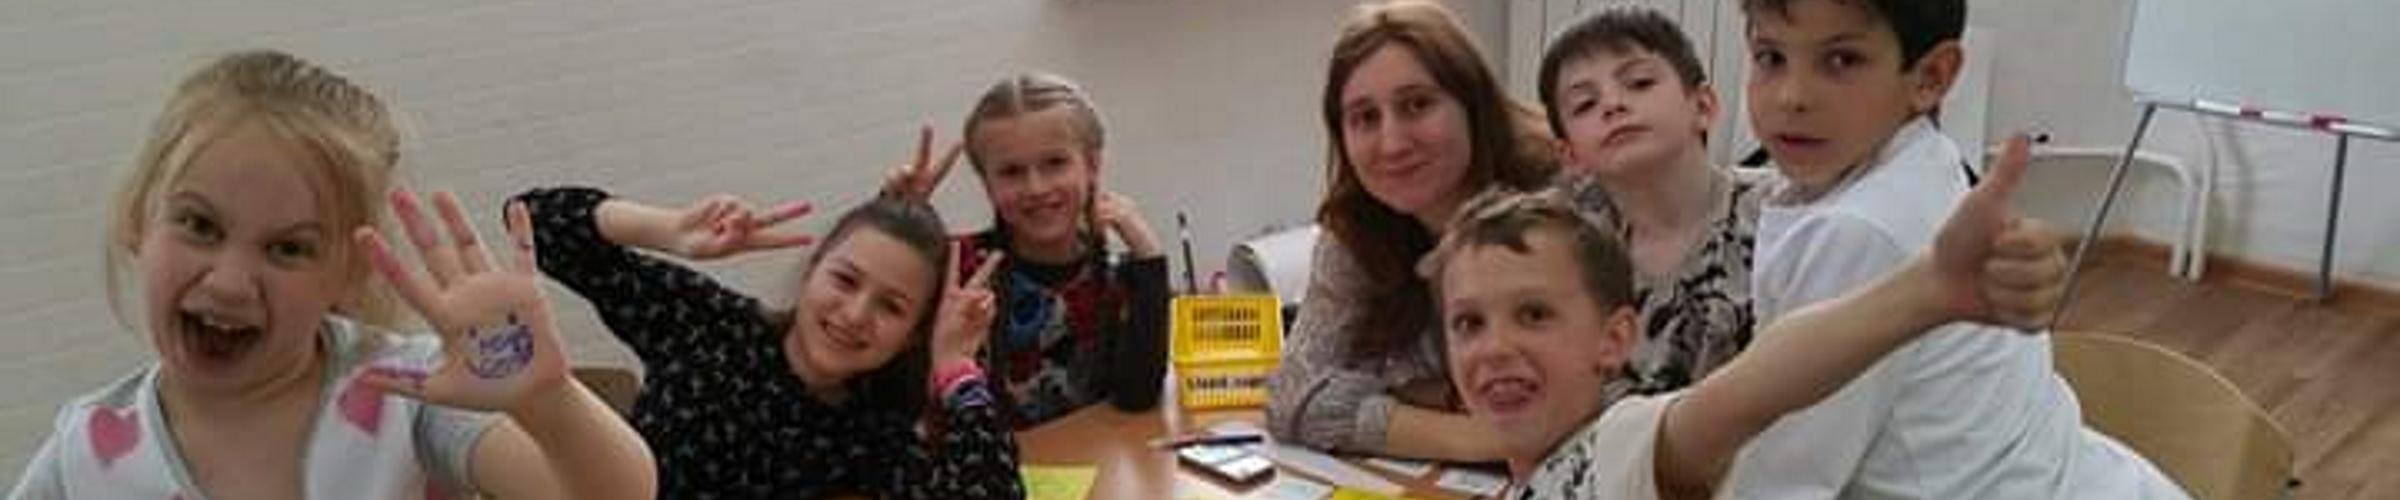 CDEC to welcome Anastasia Avdieva to Cumbria for a unique P4C course